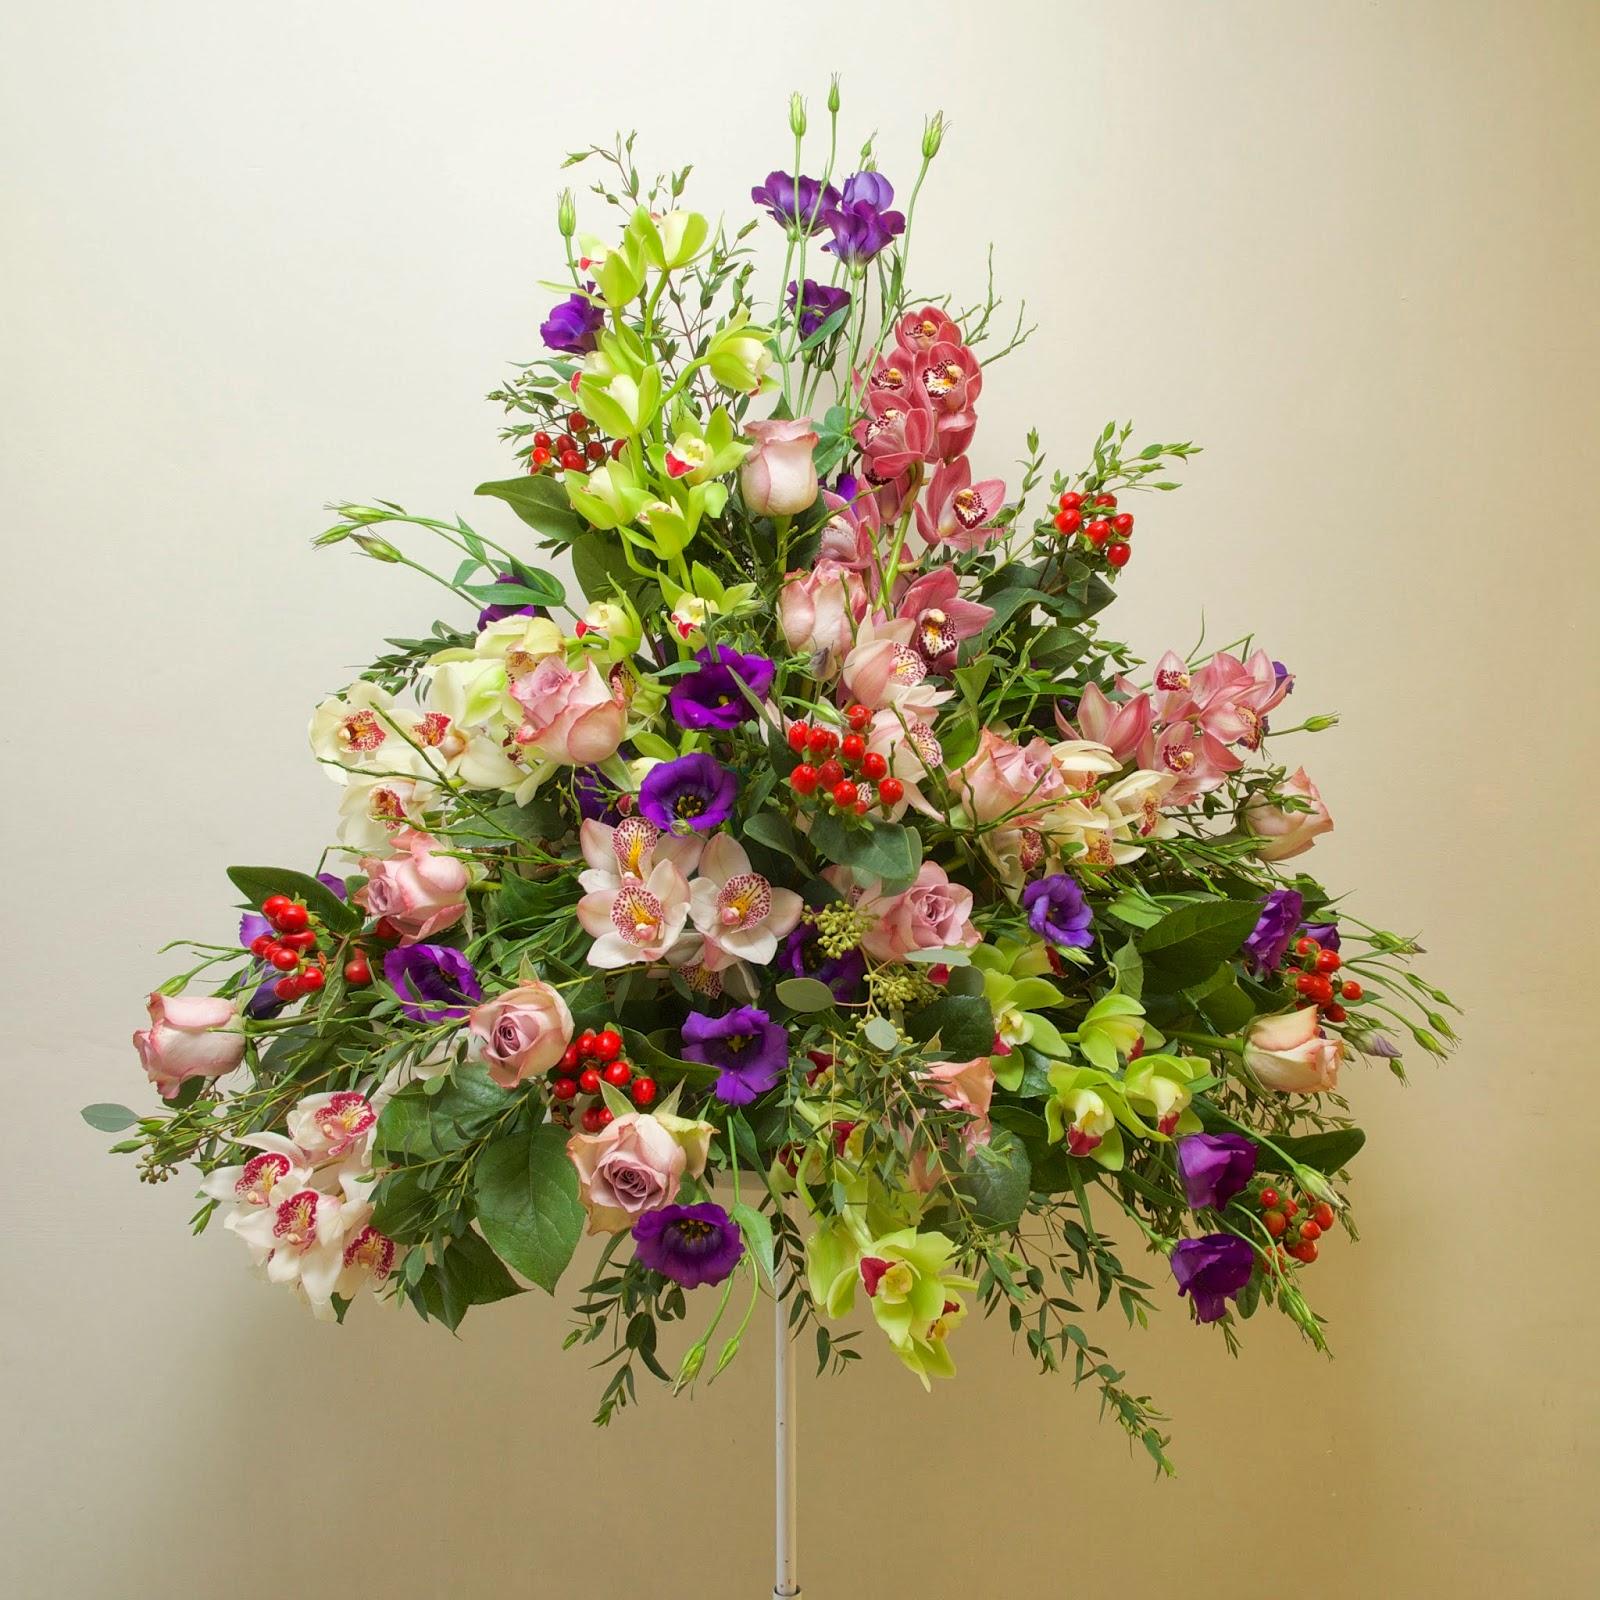 Bridal Flowers In November : November wedding flowers rose and grace